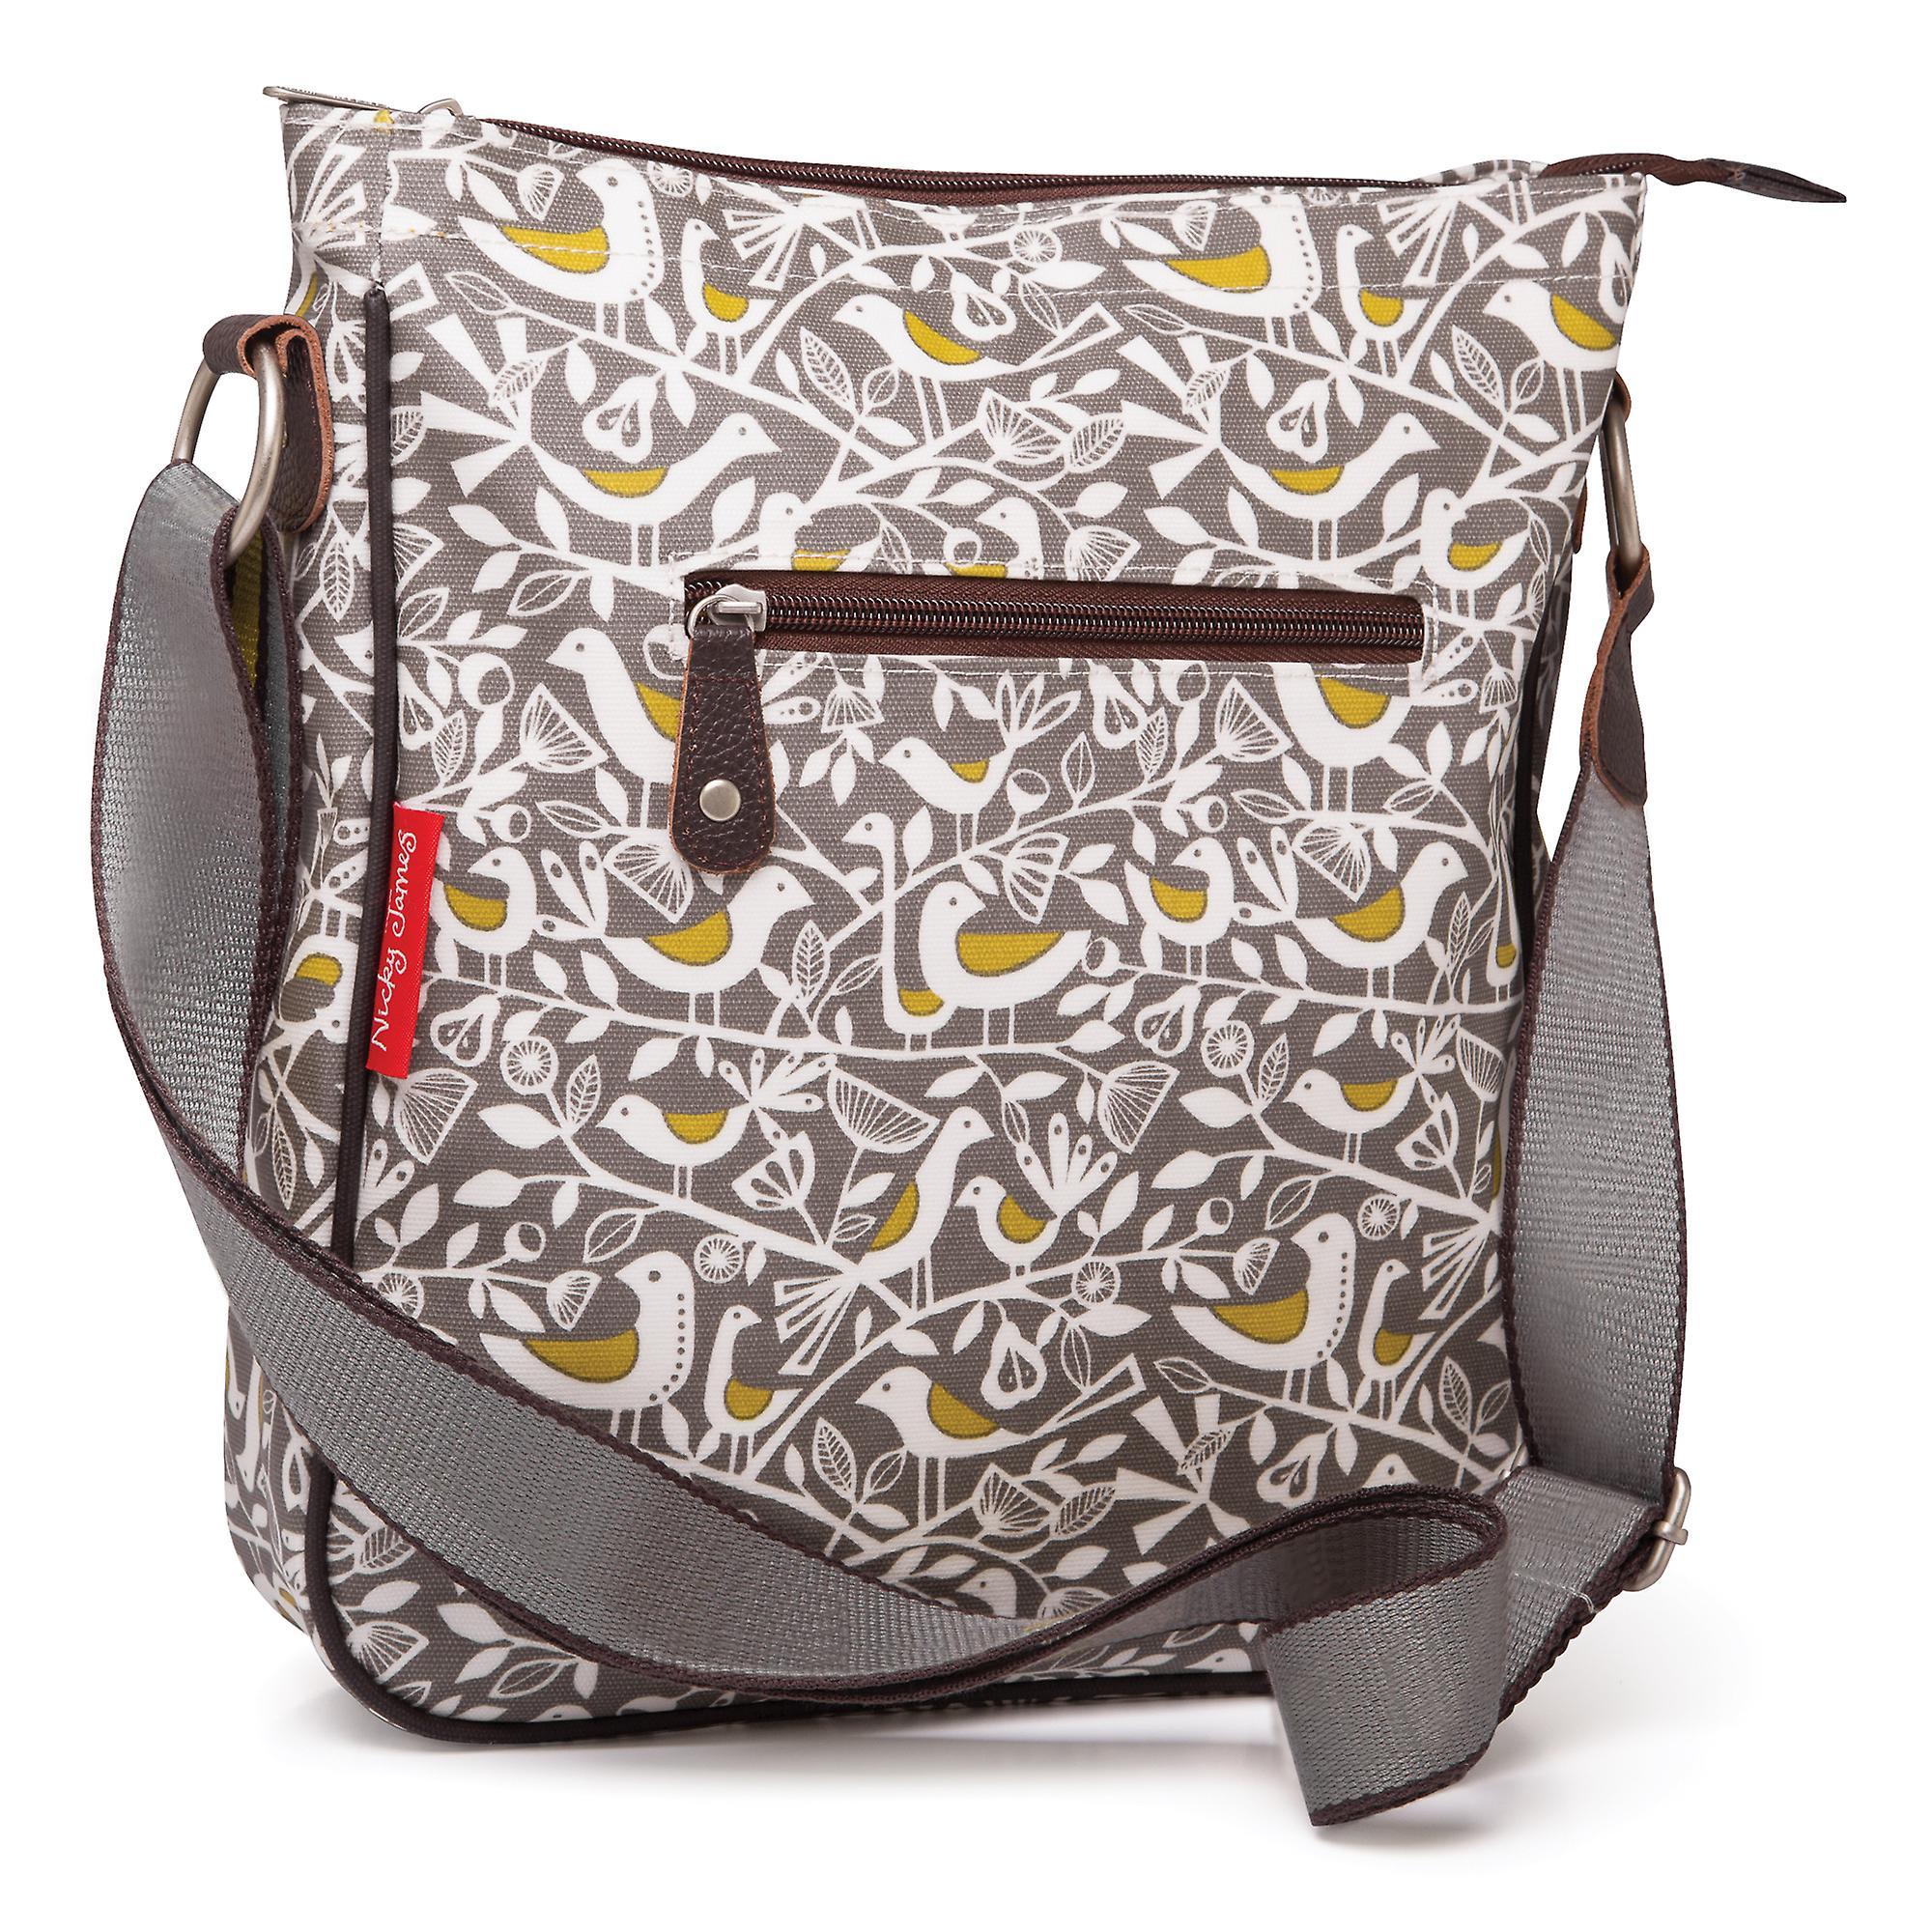 Nicky James Grey Doves Print Large Crossbody Bag